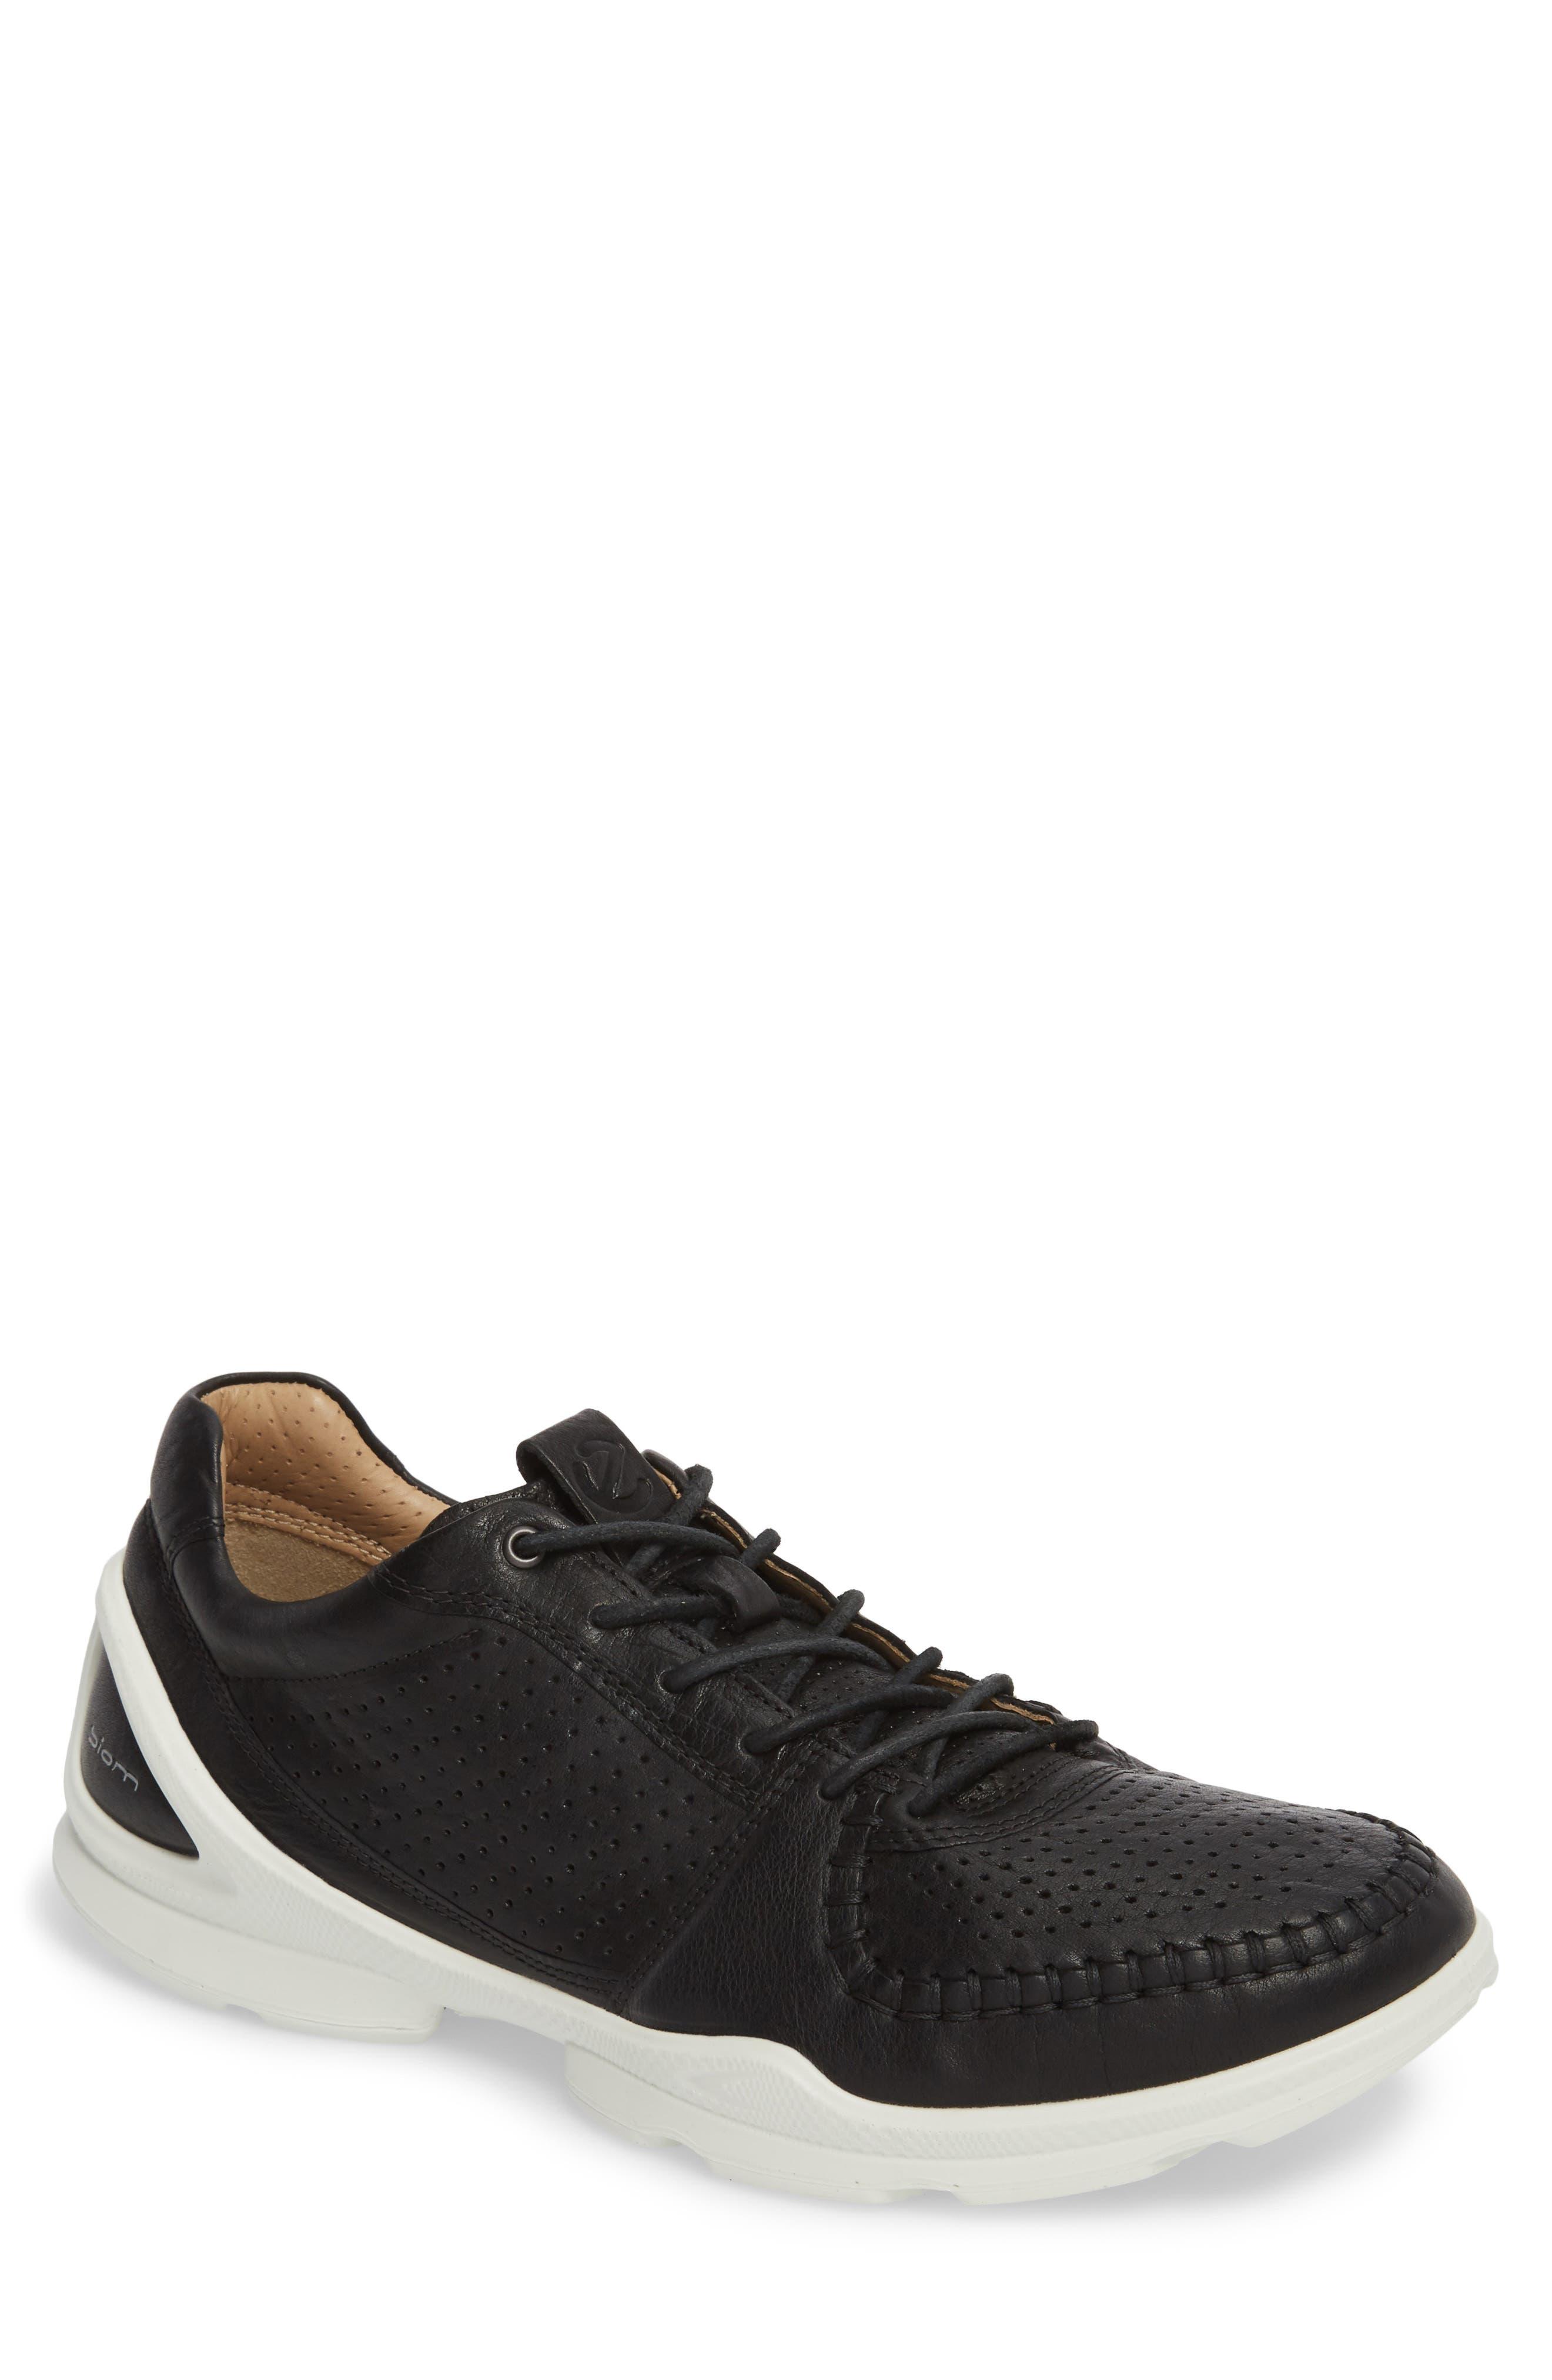 BIOM Street Moc Toe Sneaker,                         Main,                         color, Black Leather